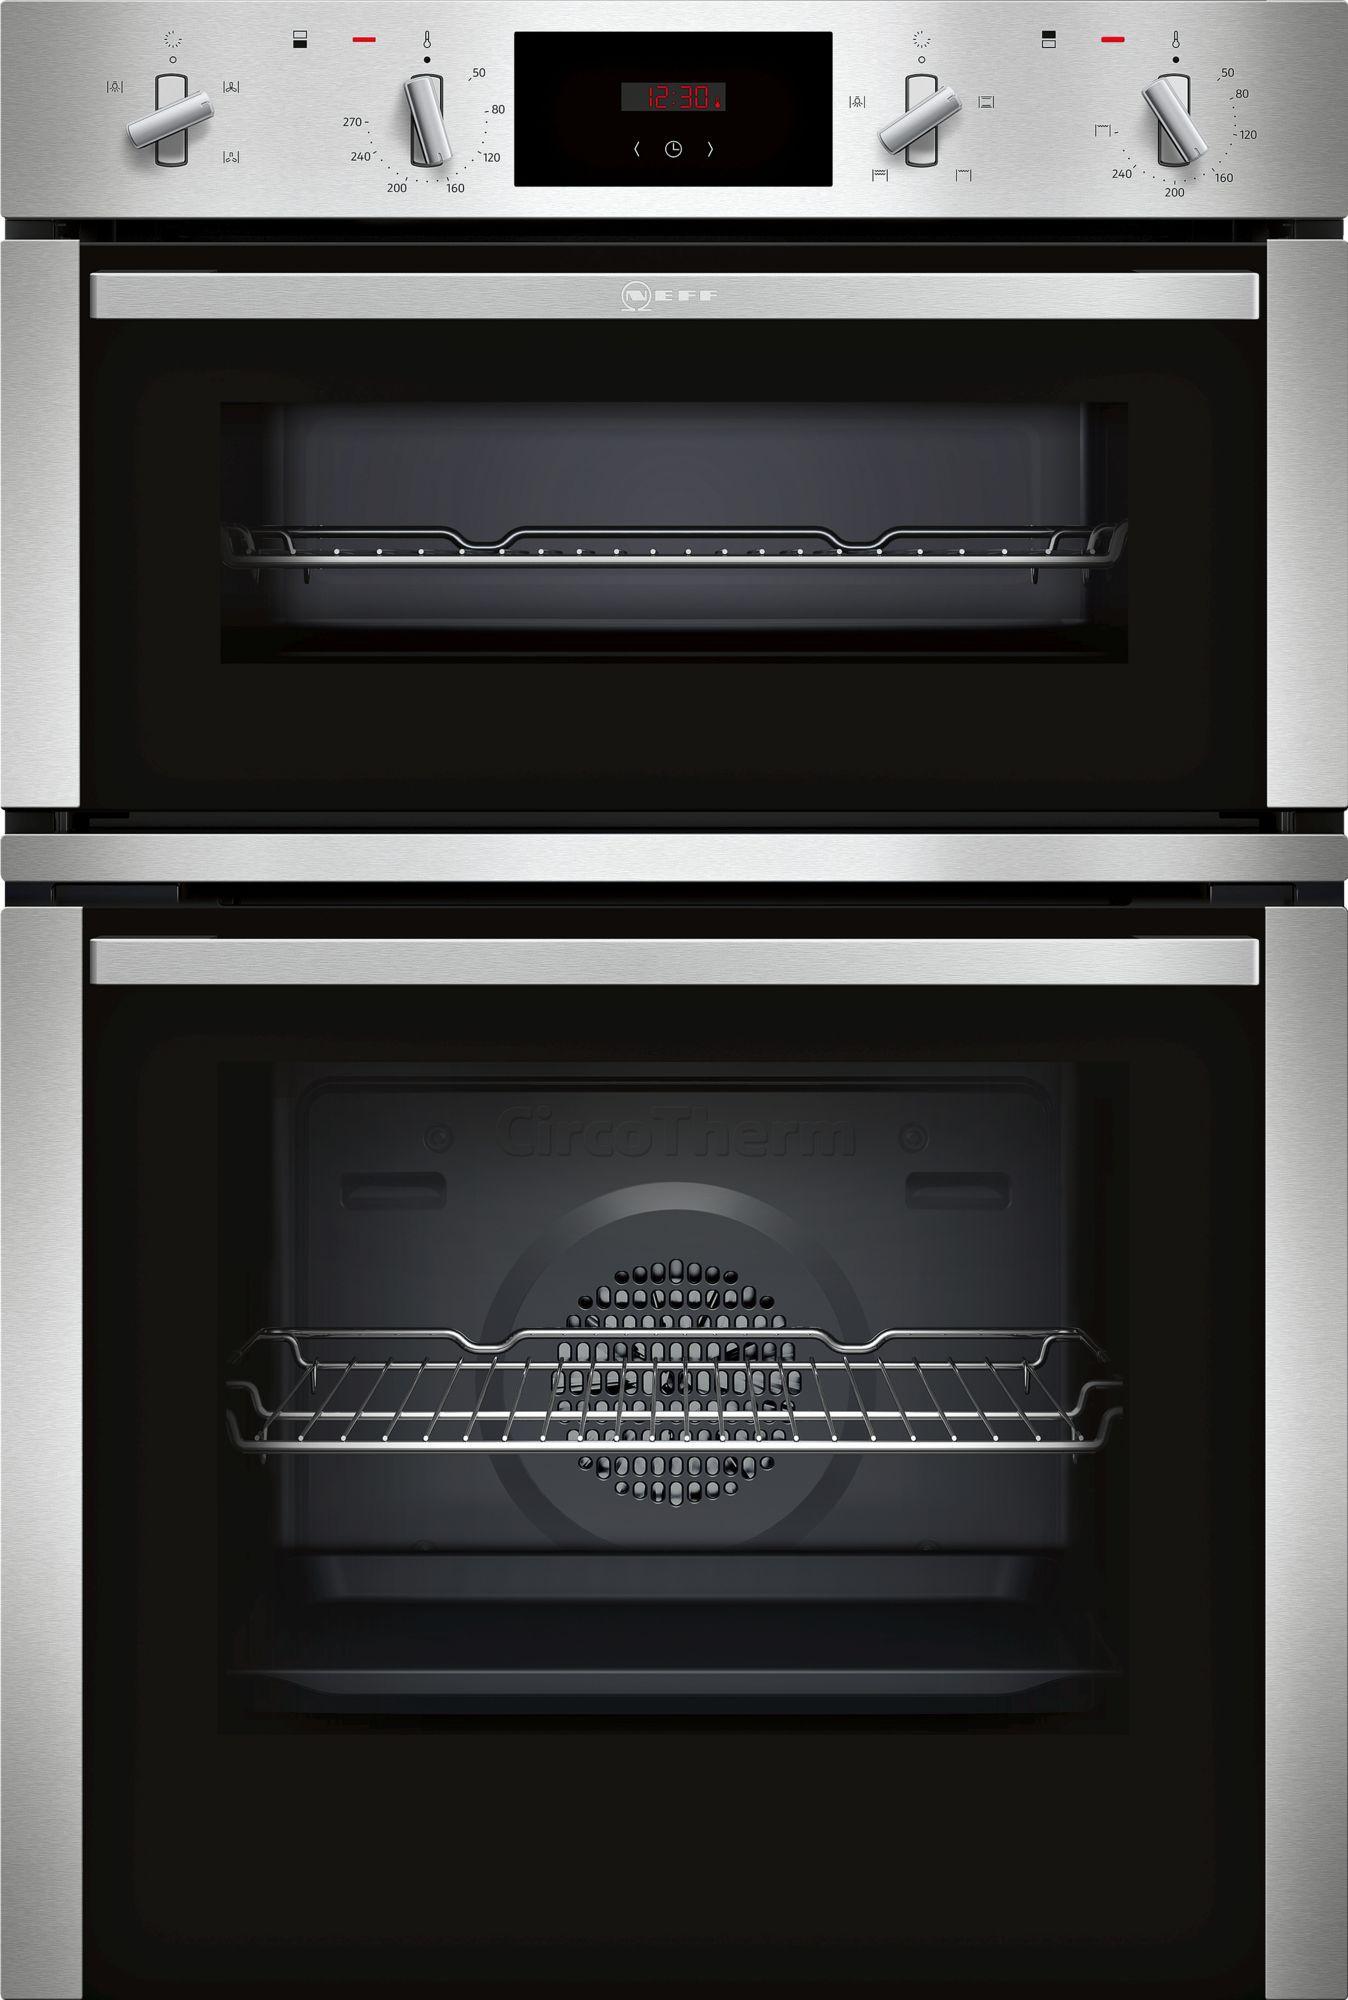 Neff N30 Double Built In Oven U1CHC0AN0B